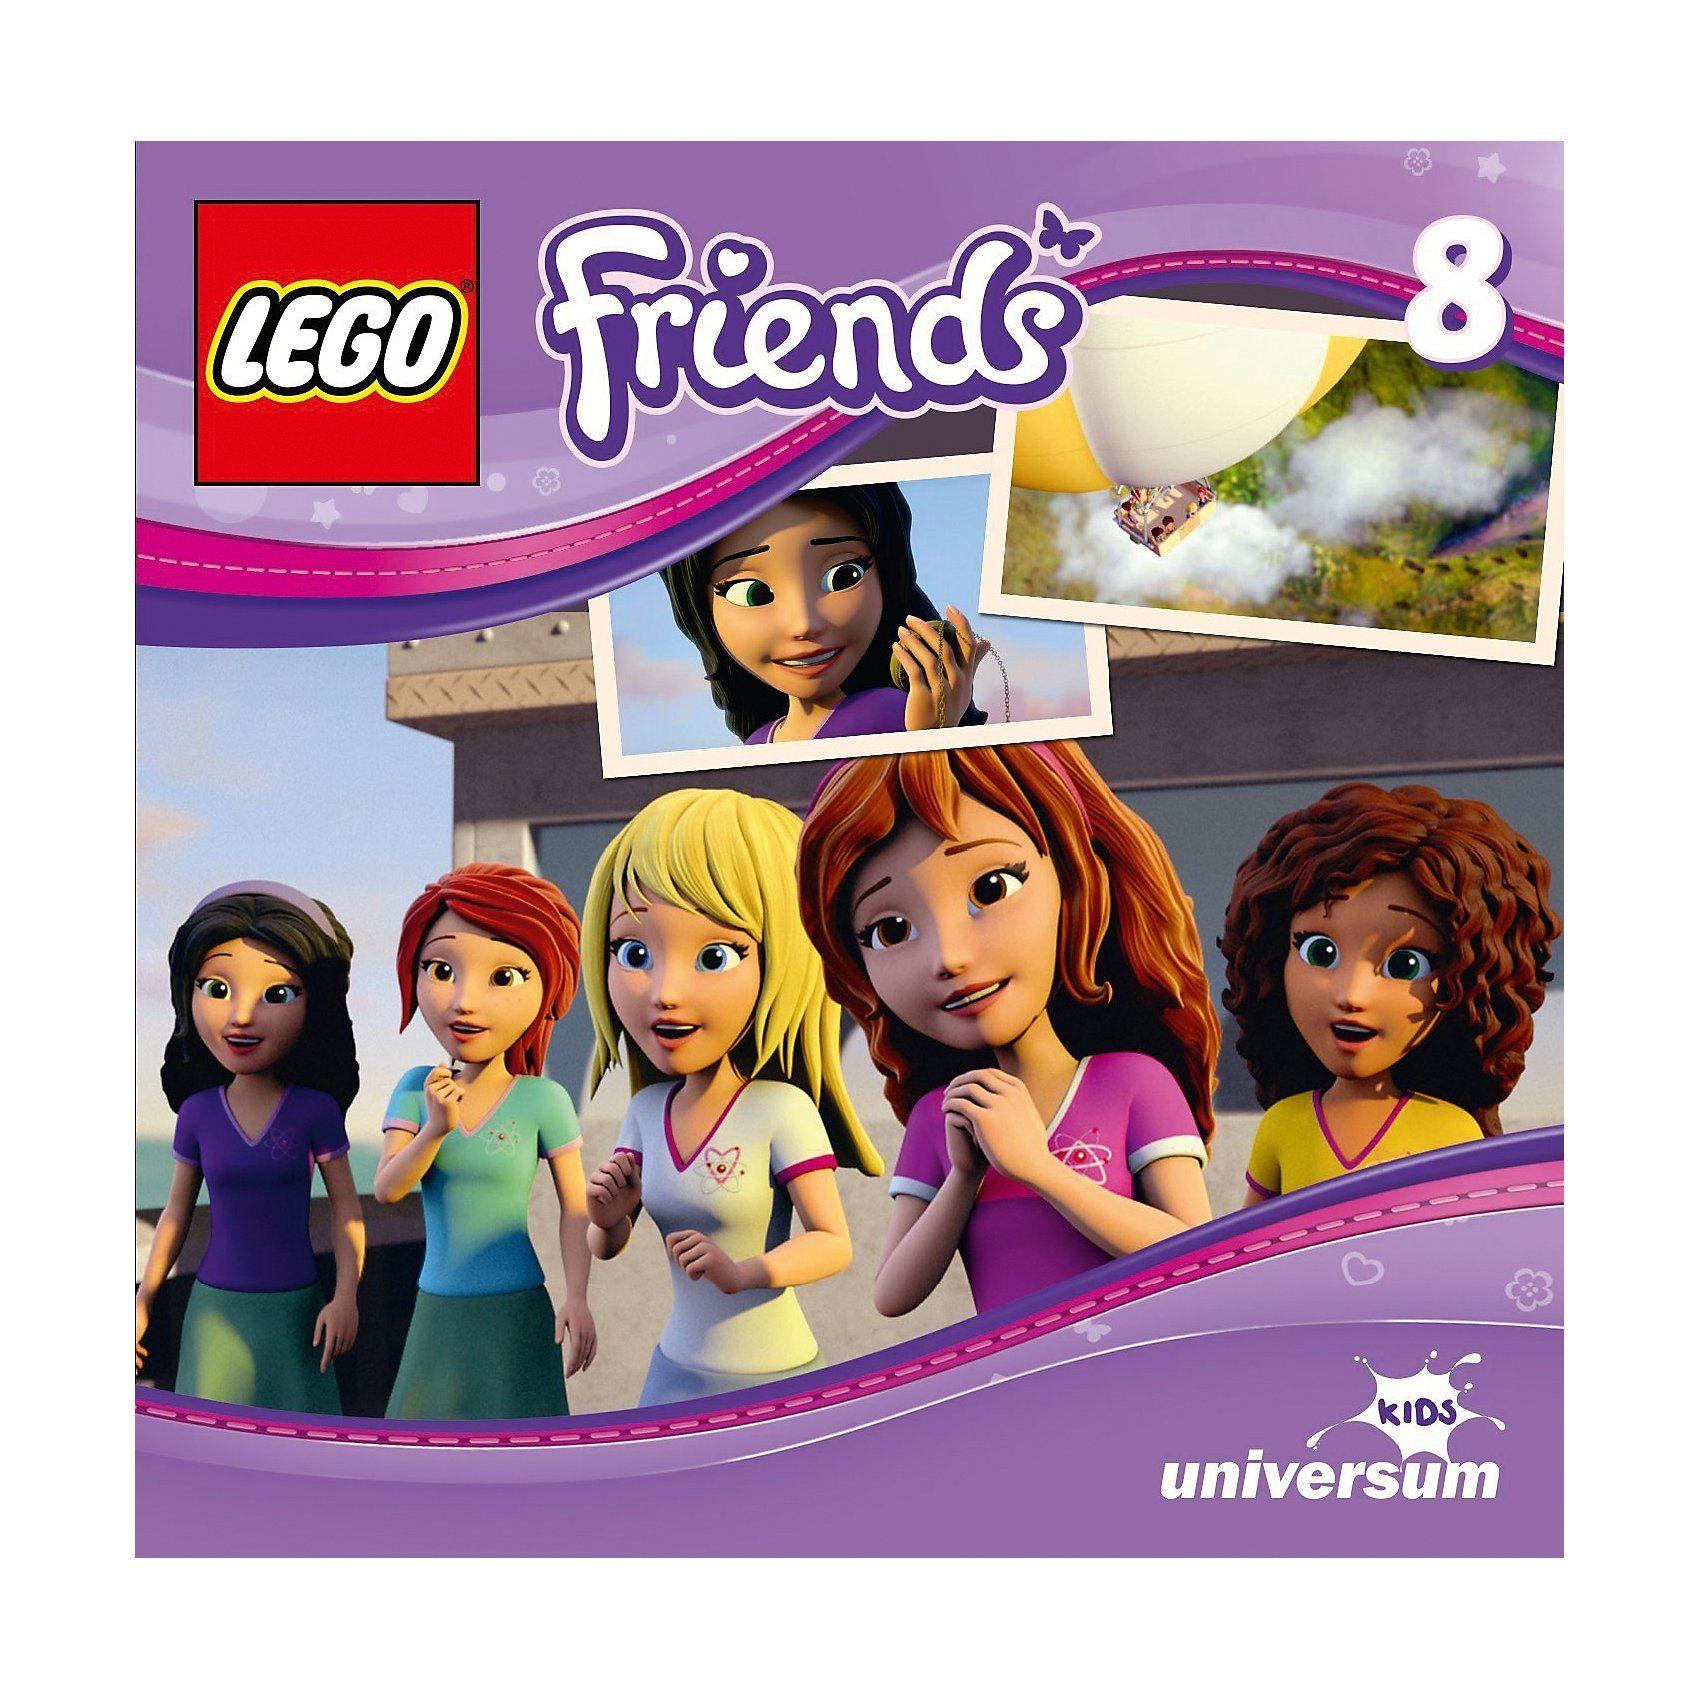 LEGO CD Friends CD 8